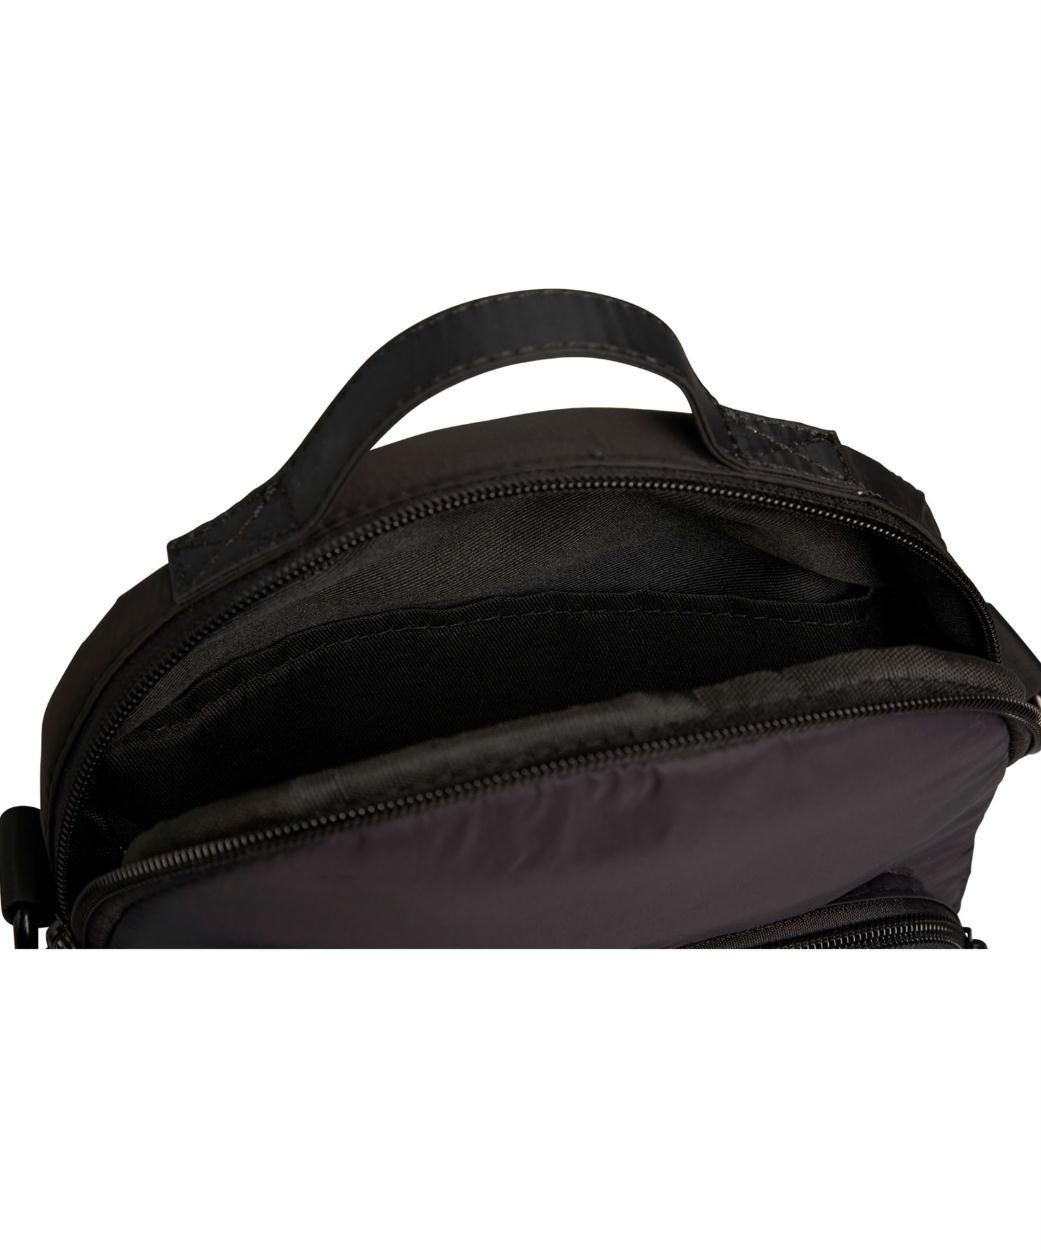 10Days Black Utility Bag 20.955.9103